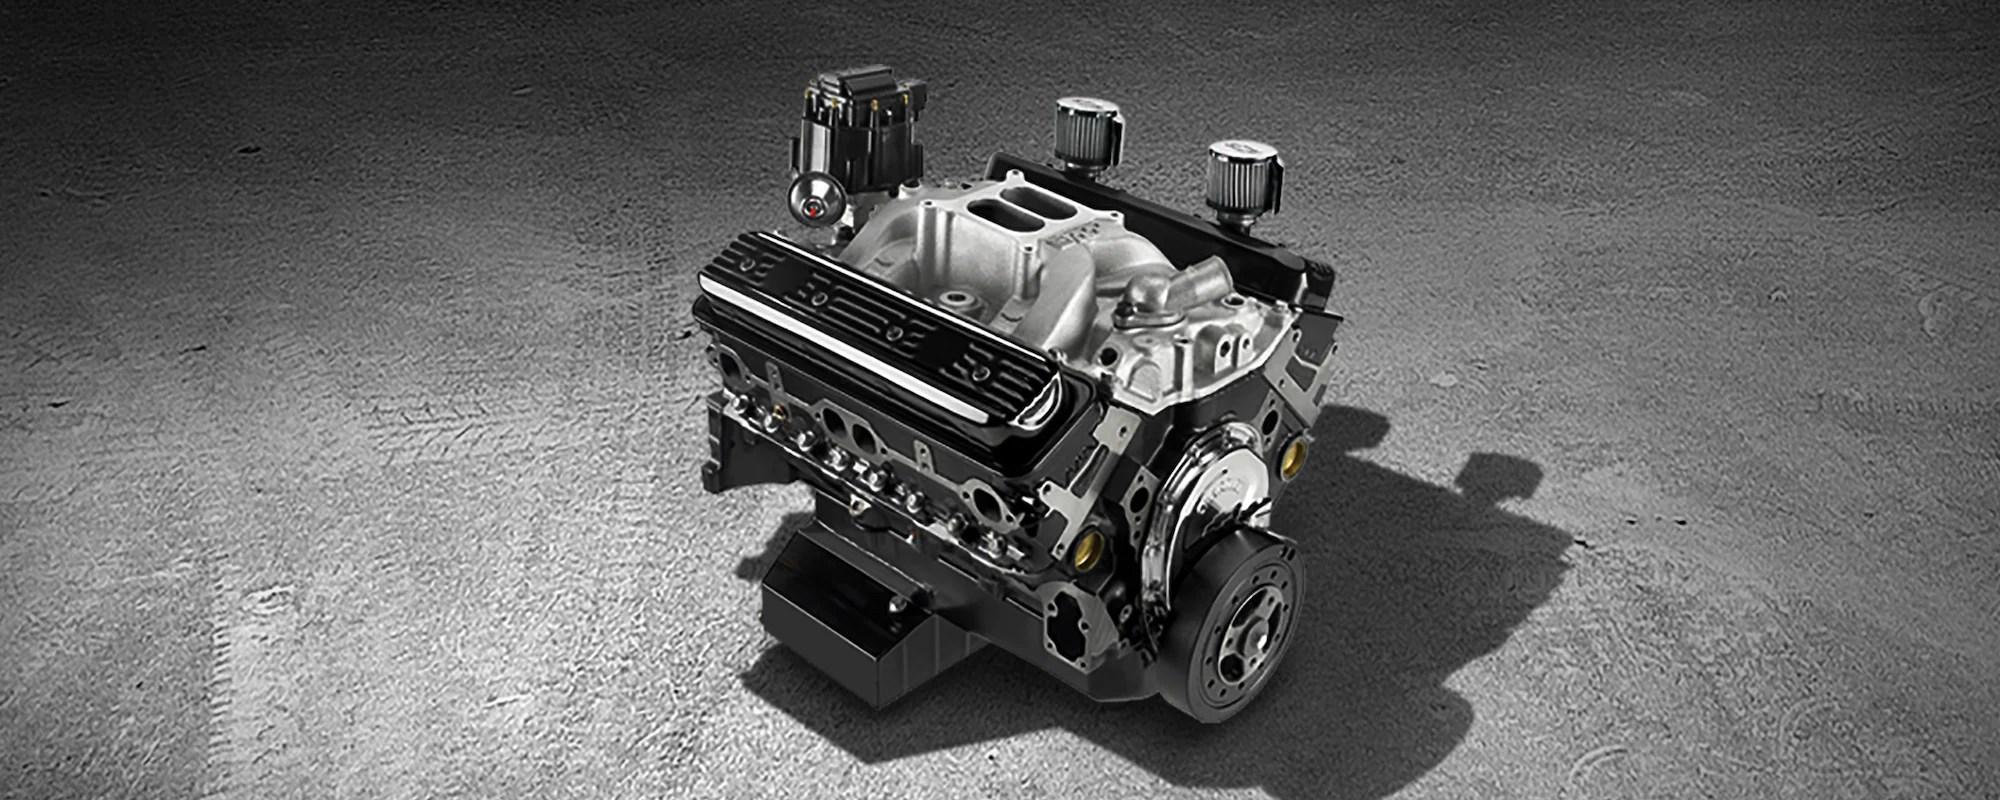 Block Chevy Crate Engine Chevy Vortec 5 7 Wiring Diagram Chevy 350